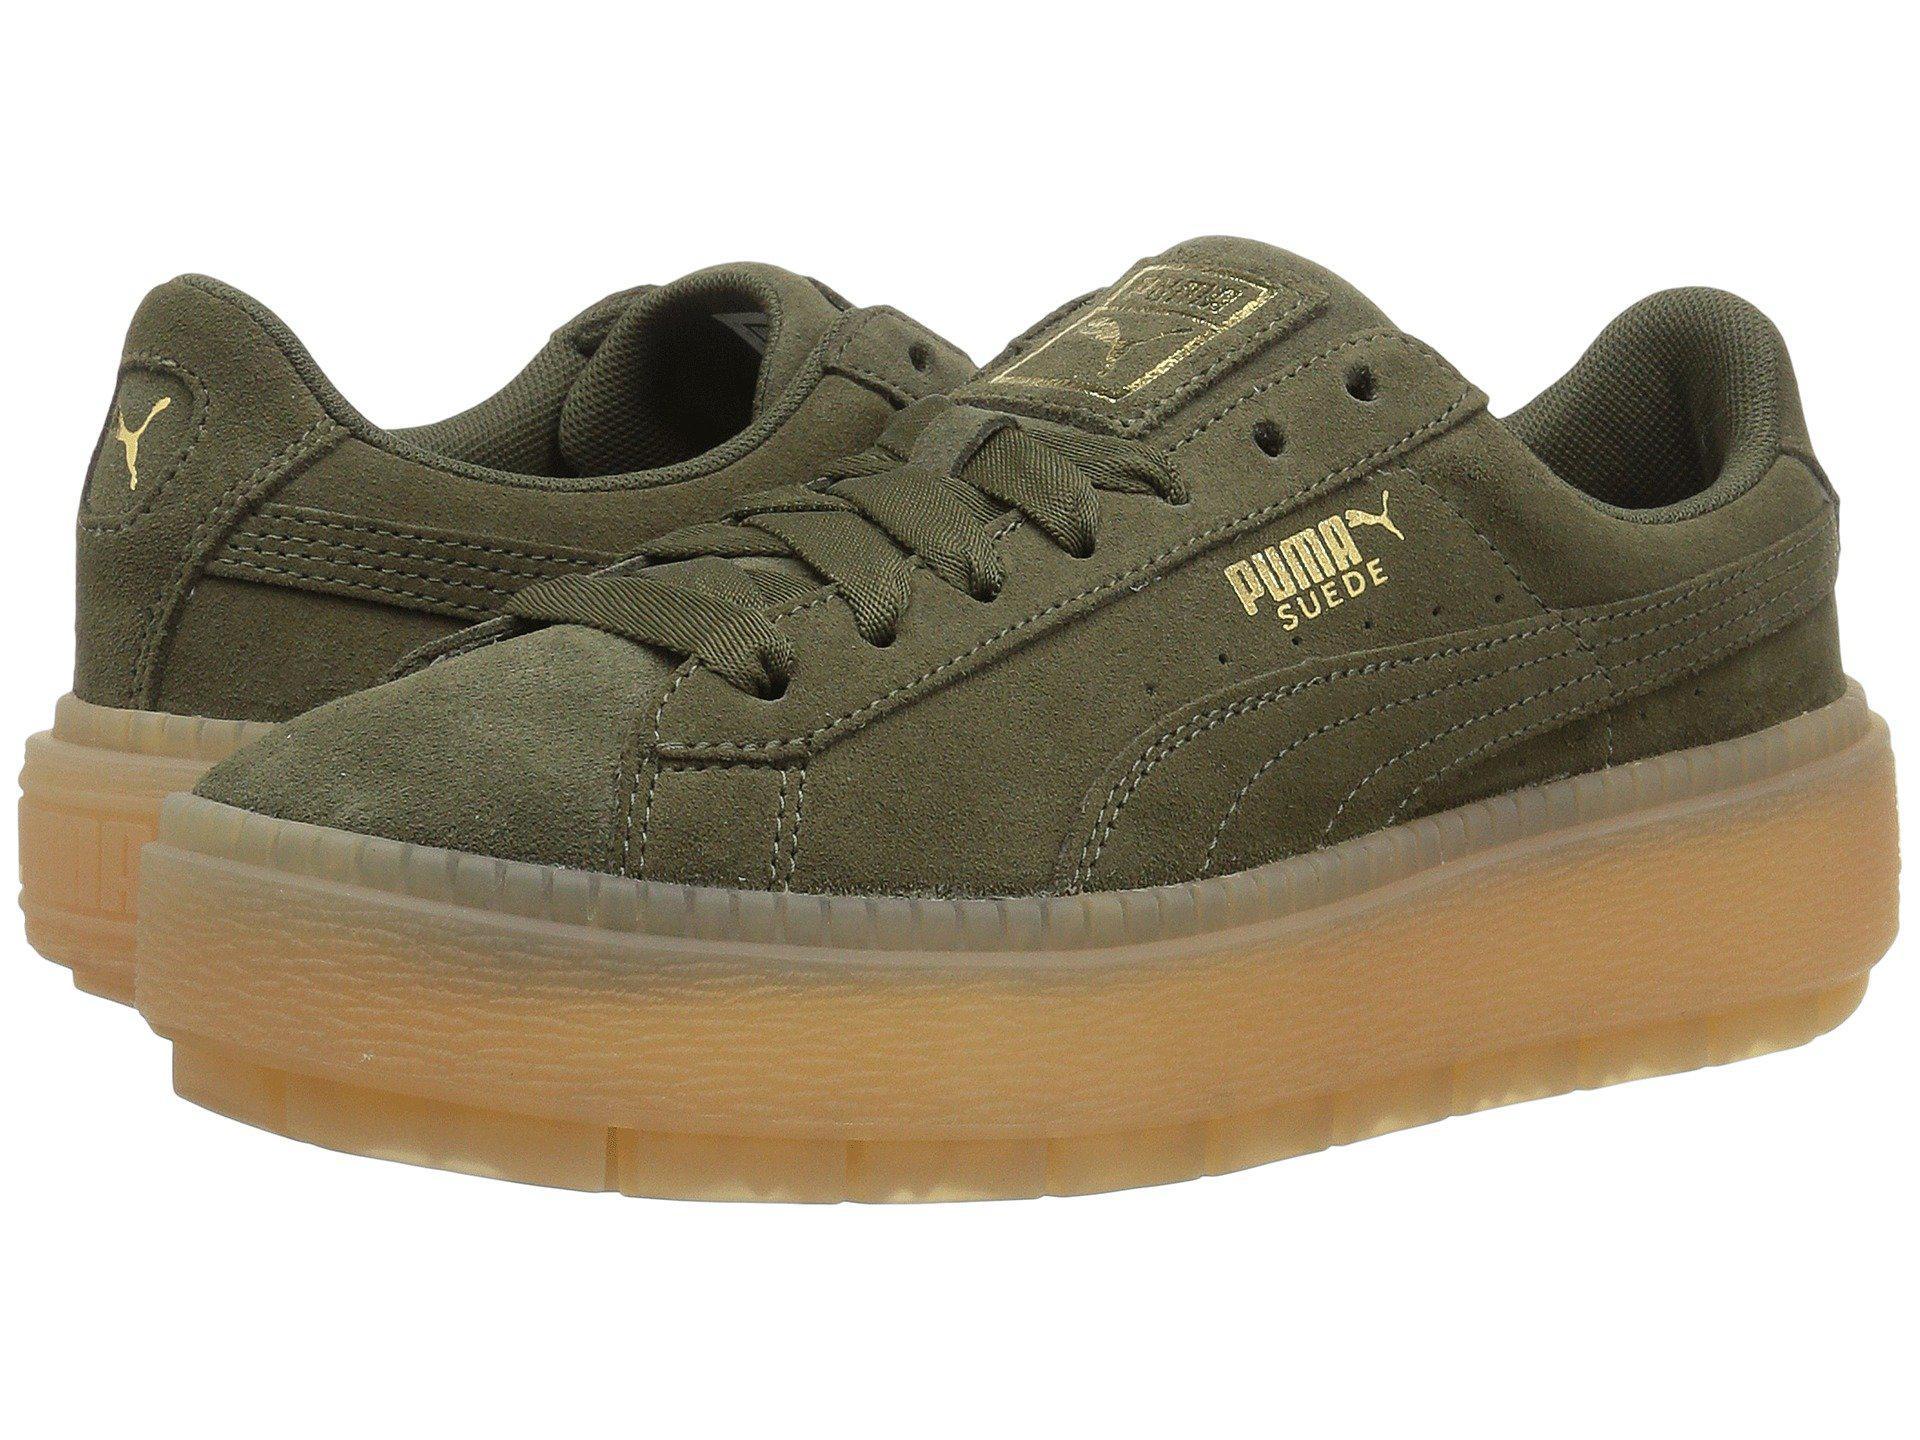 Lyst - Puma Suede Platform Trace ( Black  Black) Women s Shoes in Green 5171732371